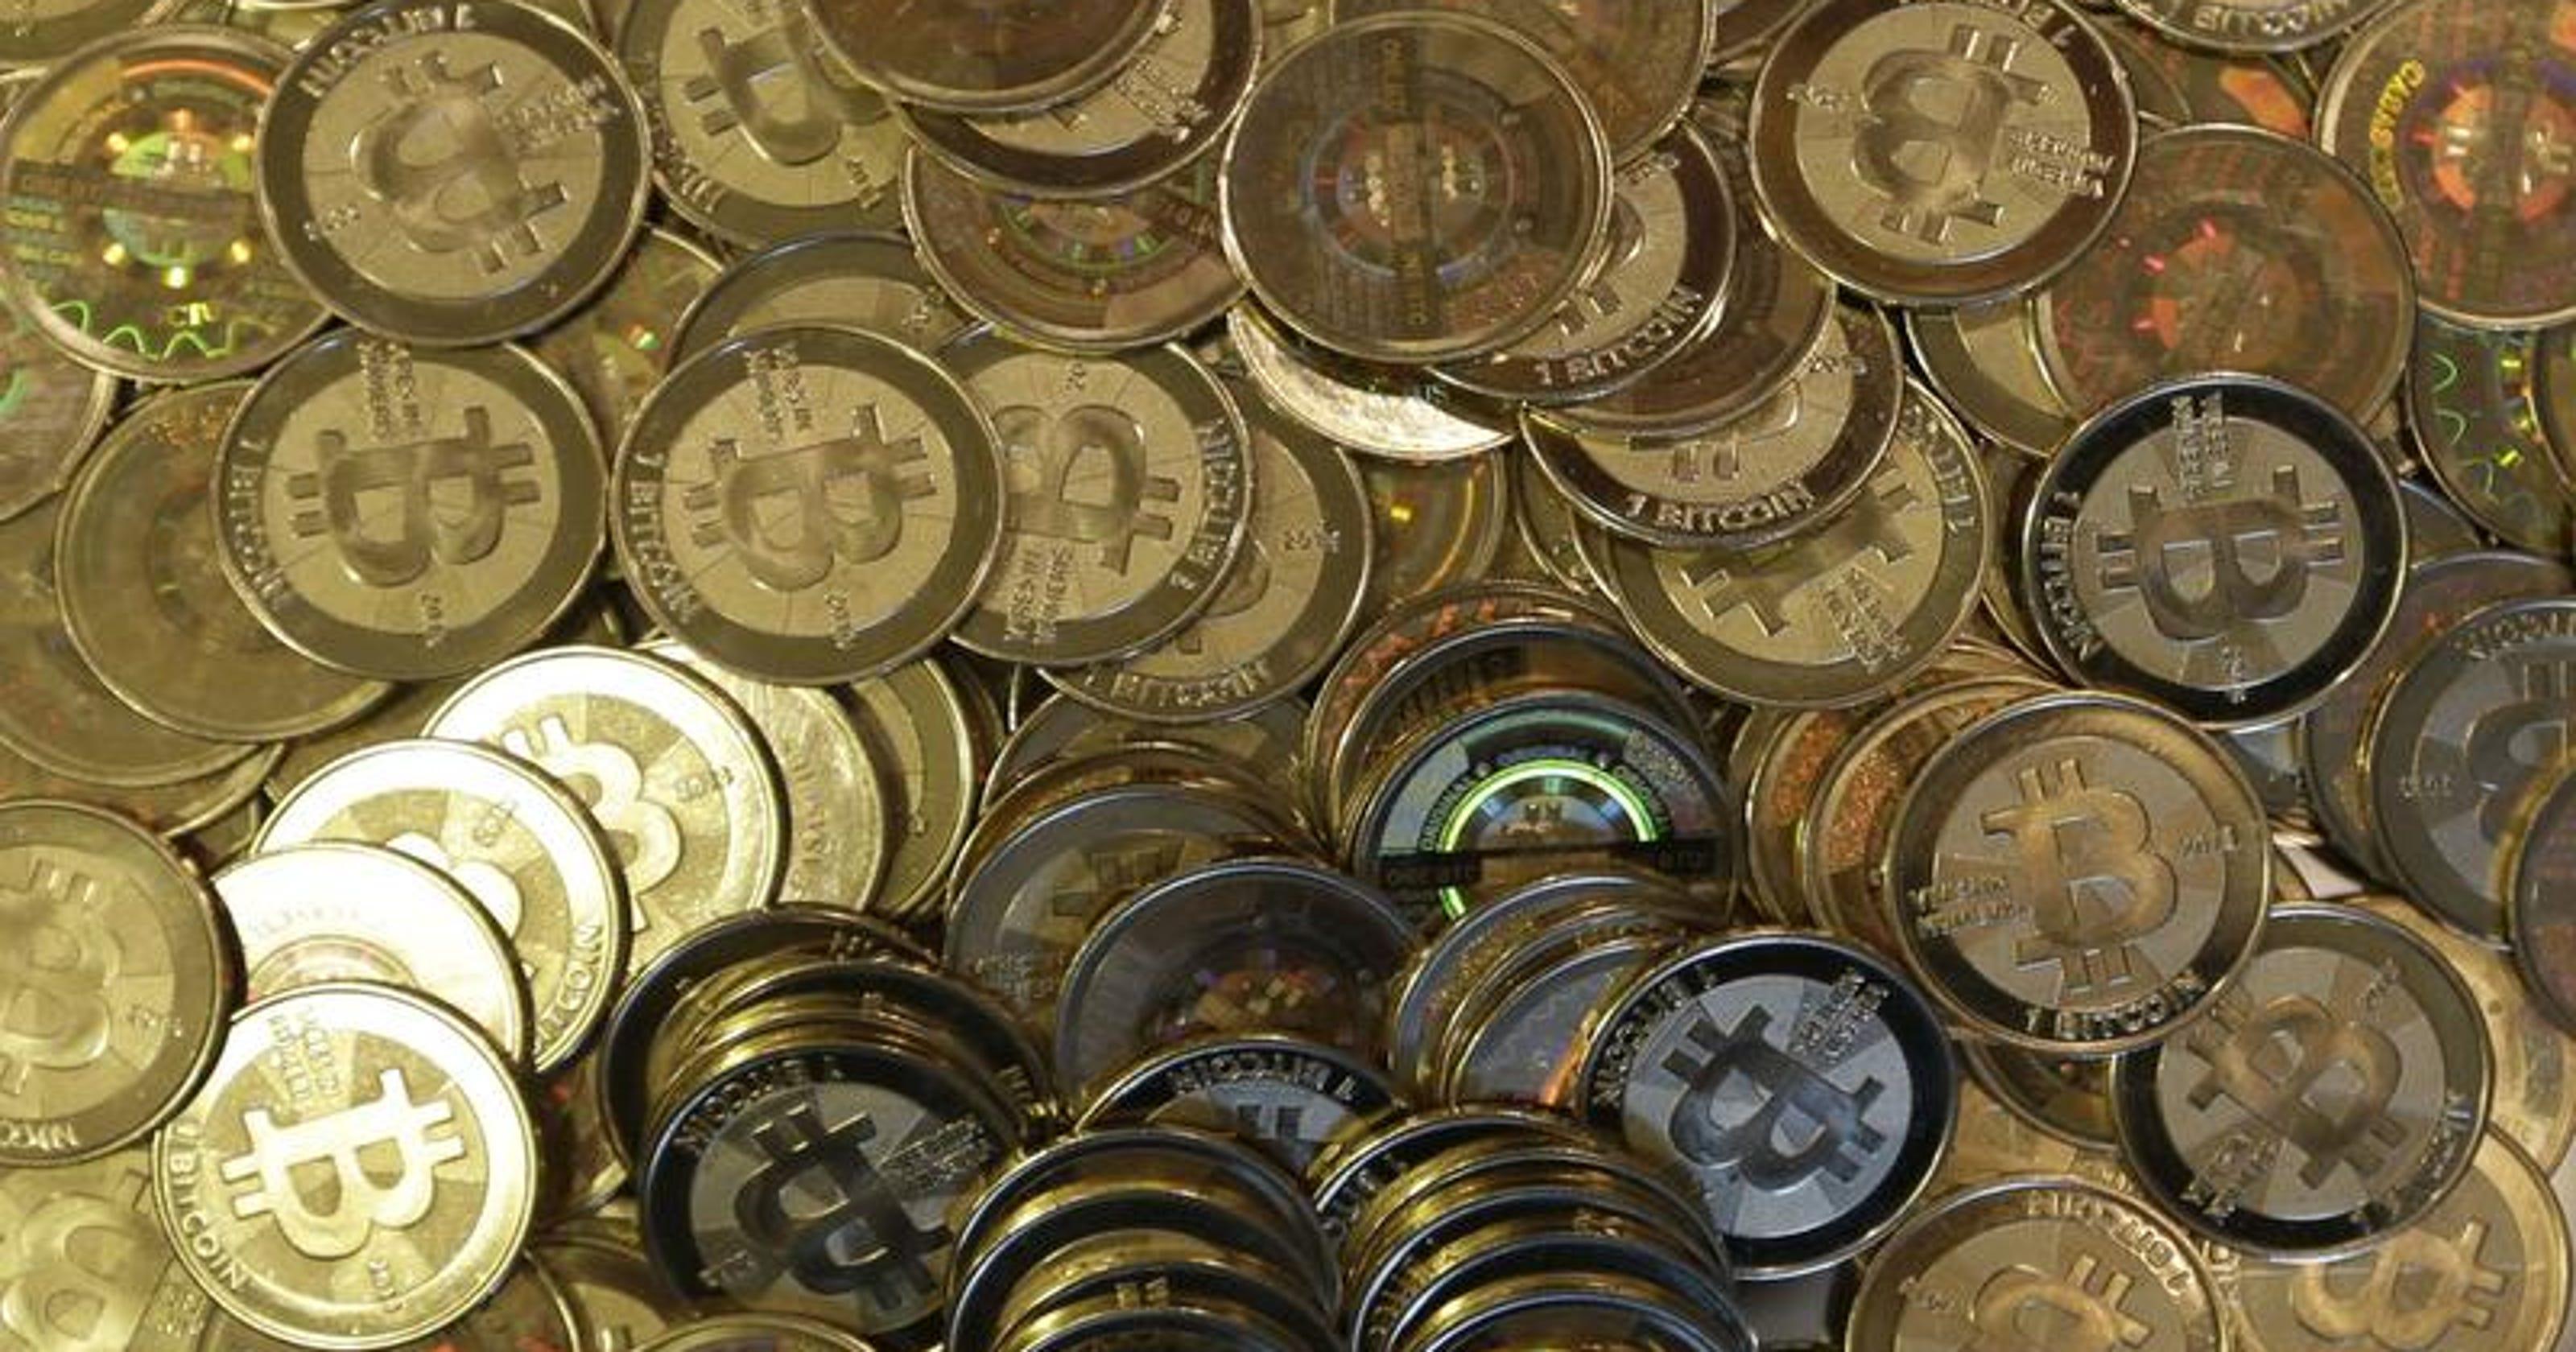 Sc2 nydus worm mining bitcoins como minerar bitcoins no ubuntu